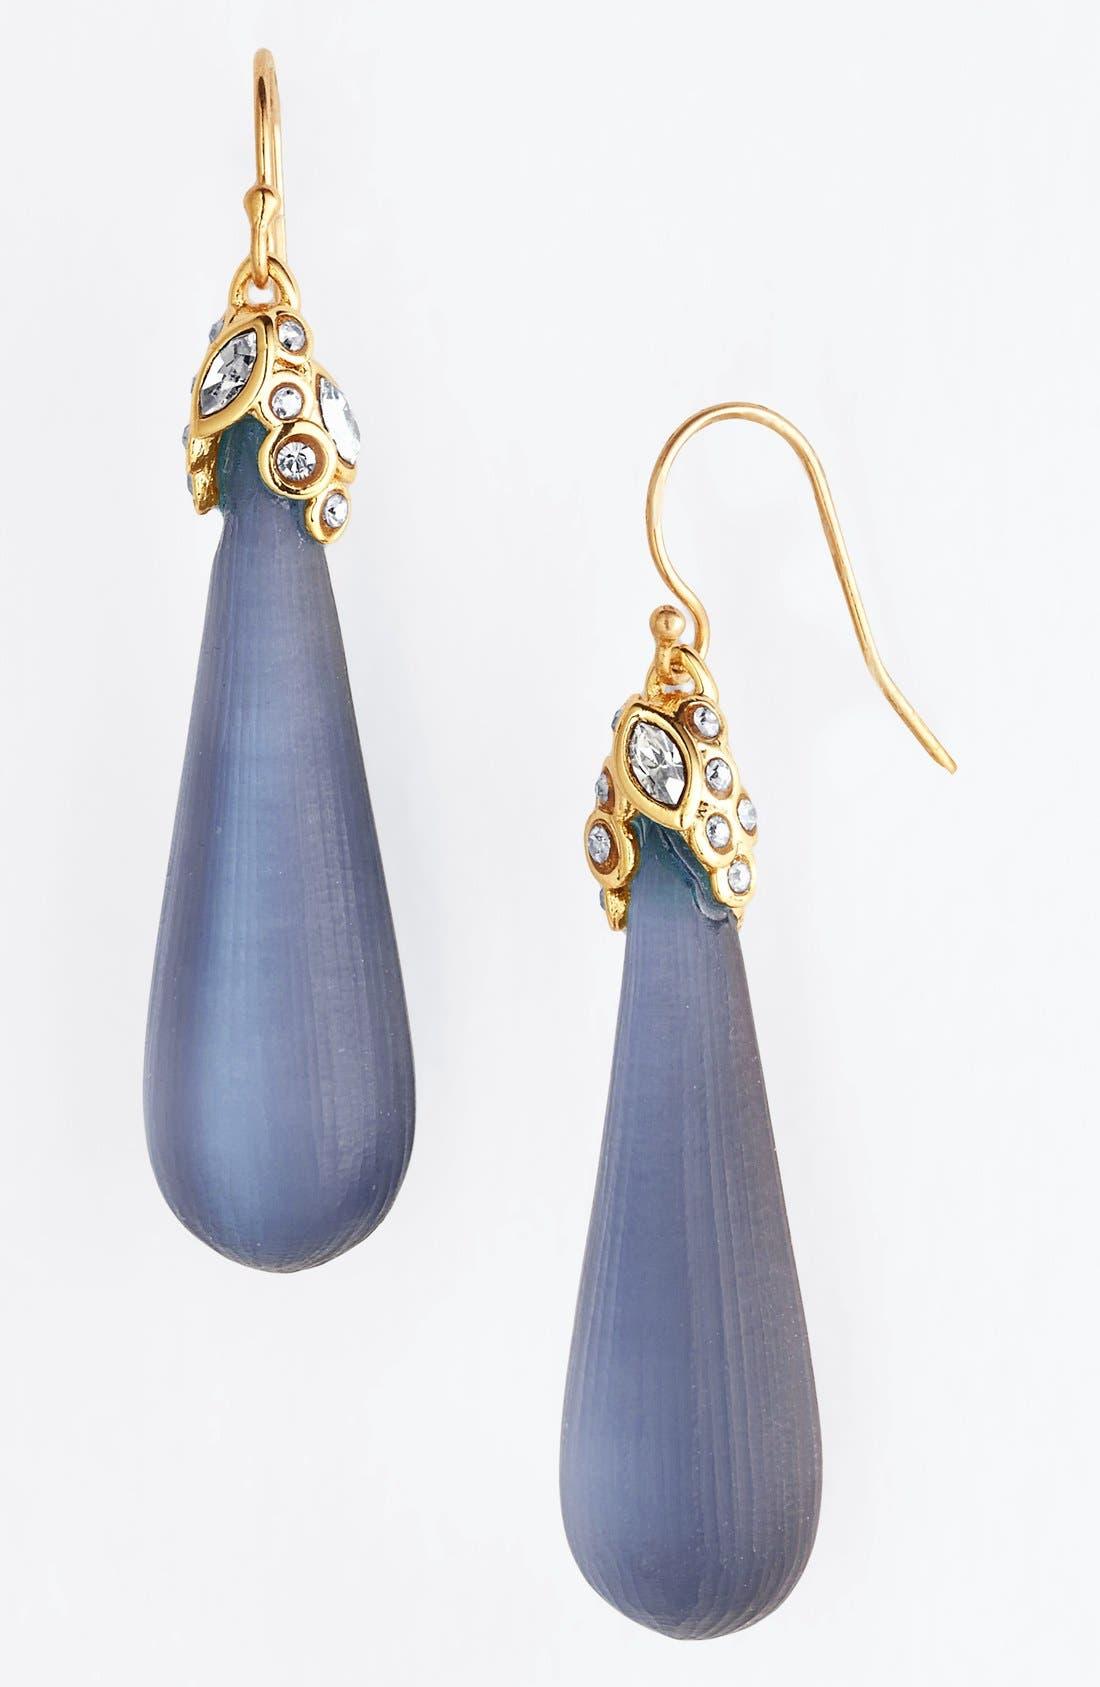 Main Image - Alexis Bittar 'Lucite® - Georgian' Teardrop Earrings (Nordstrom Exclusive)